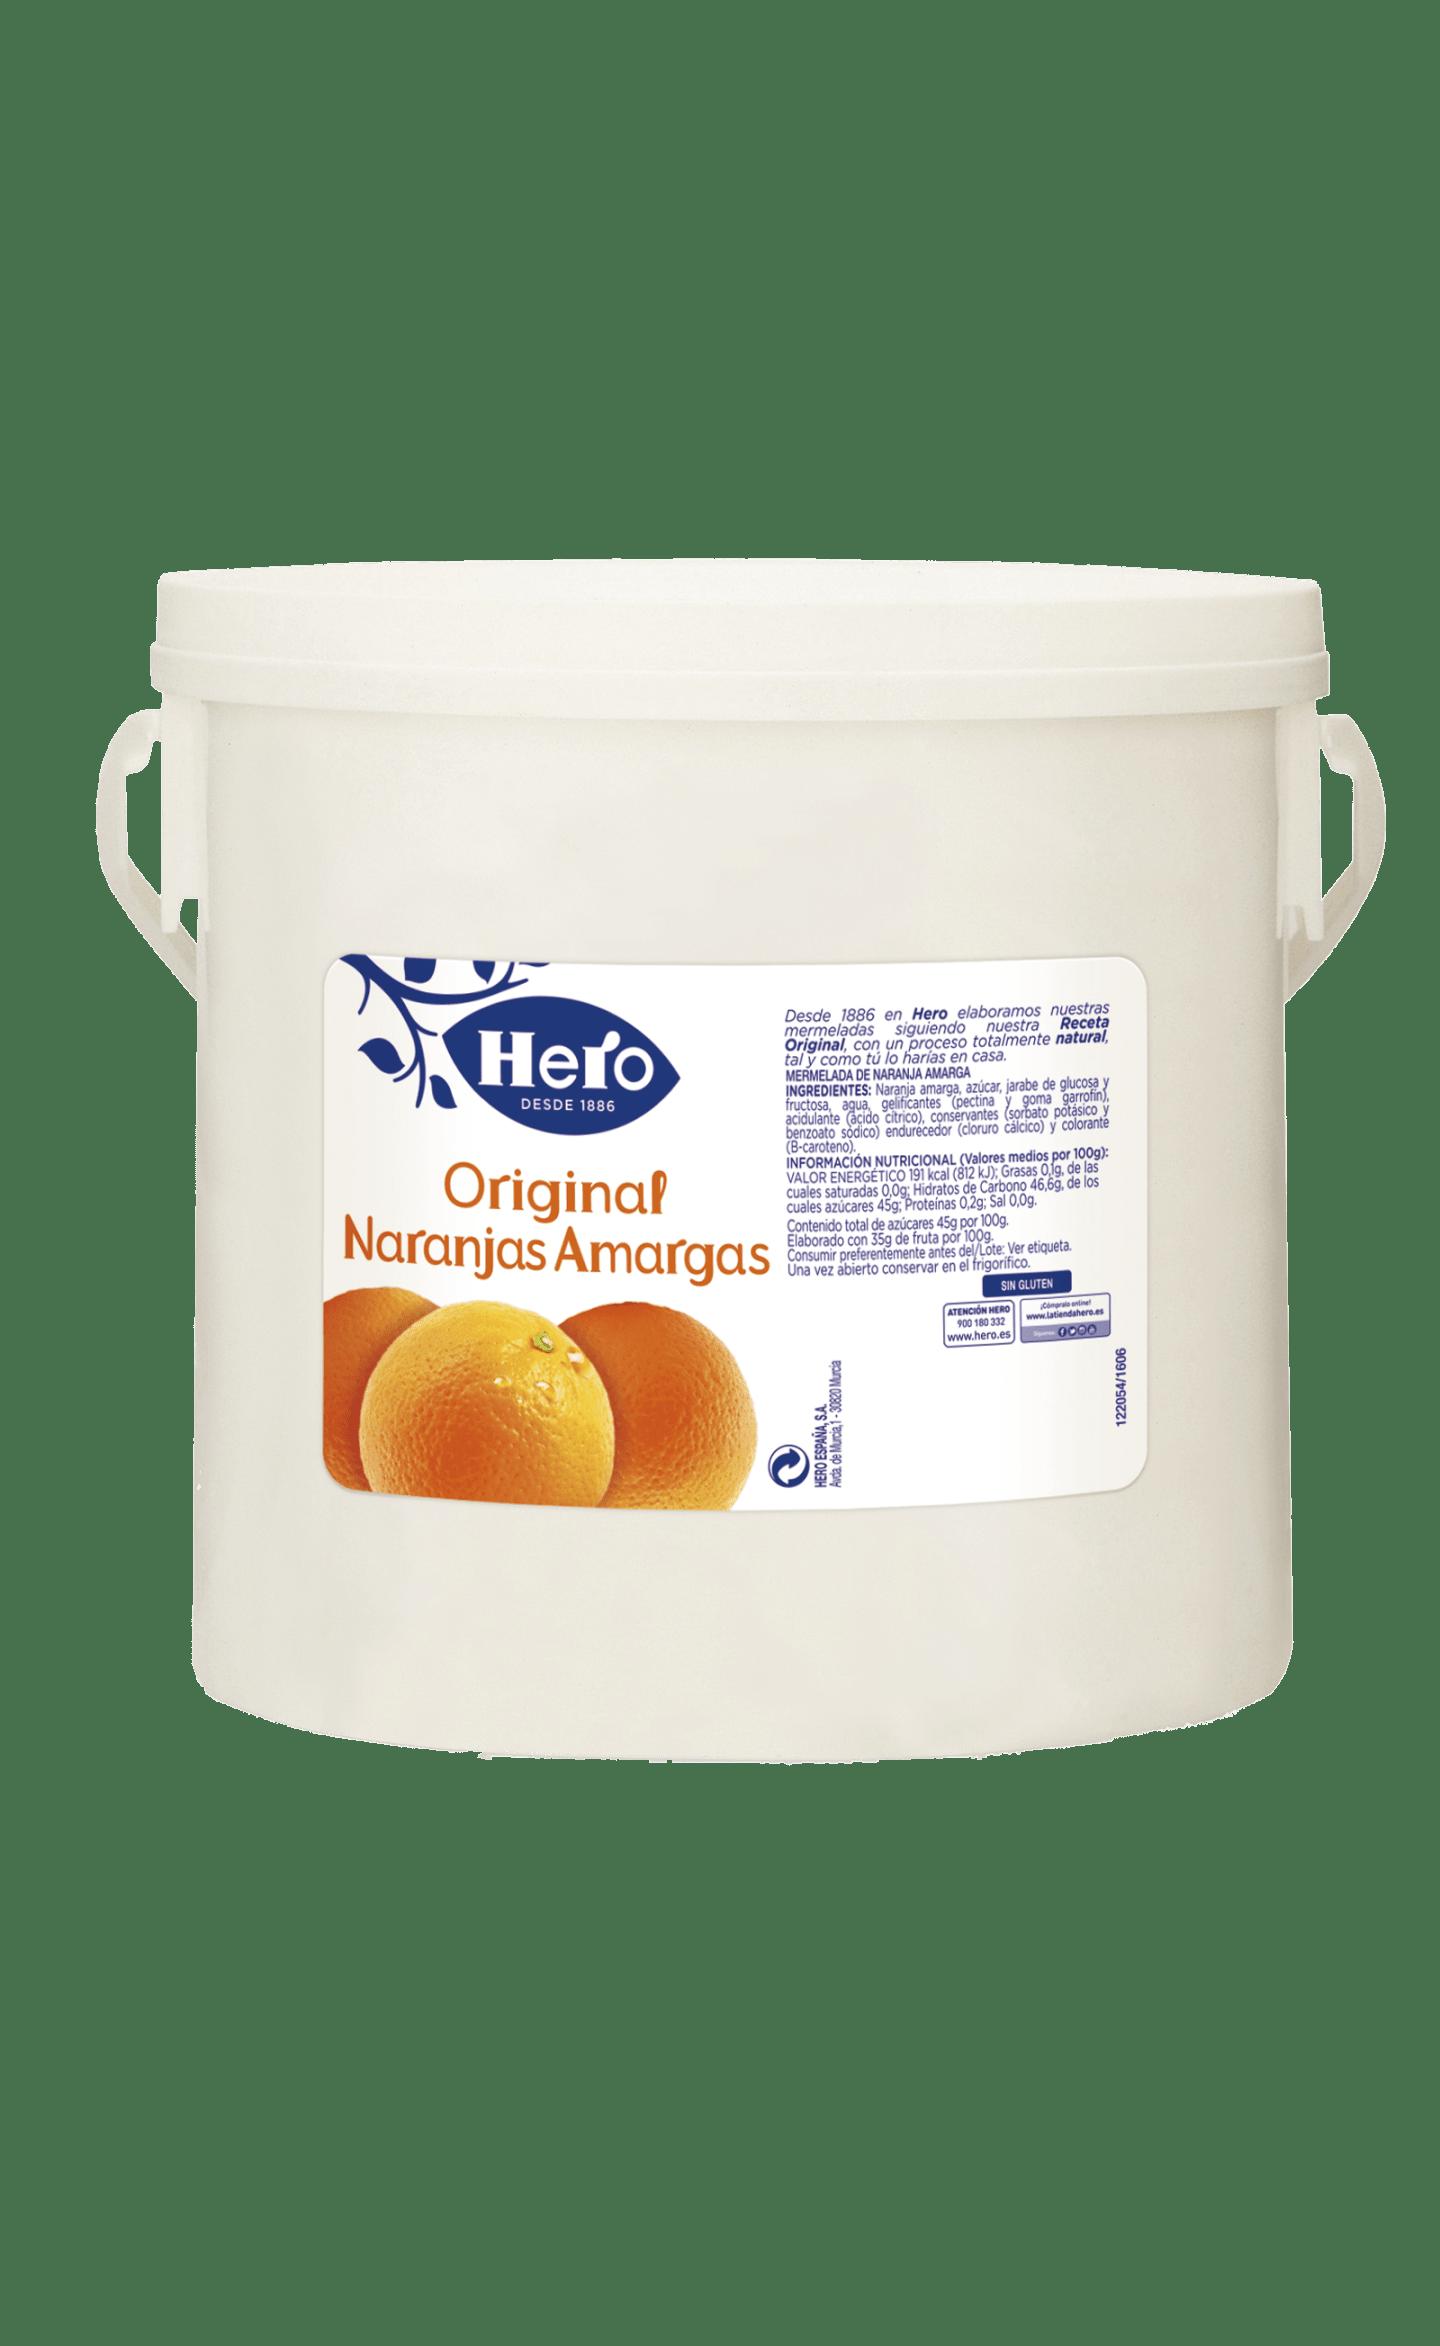 Cubo Confitura original Naranja Amarga